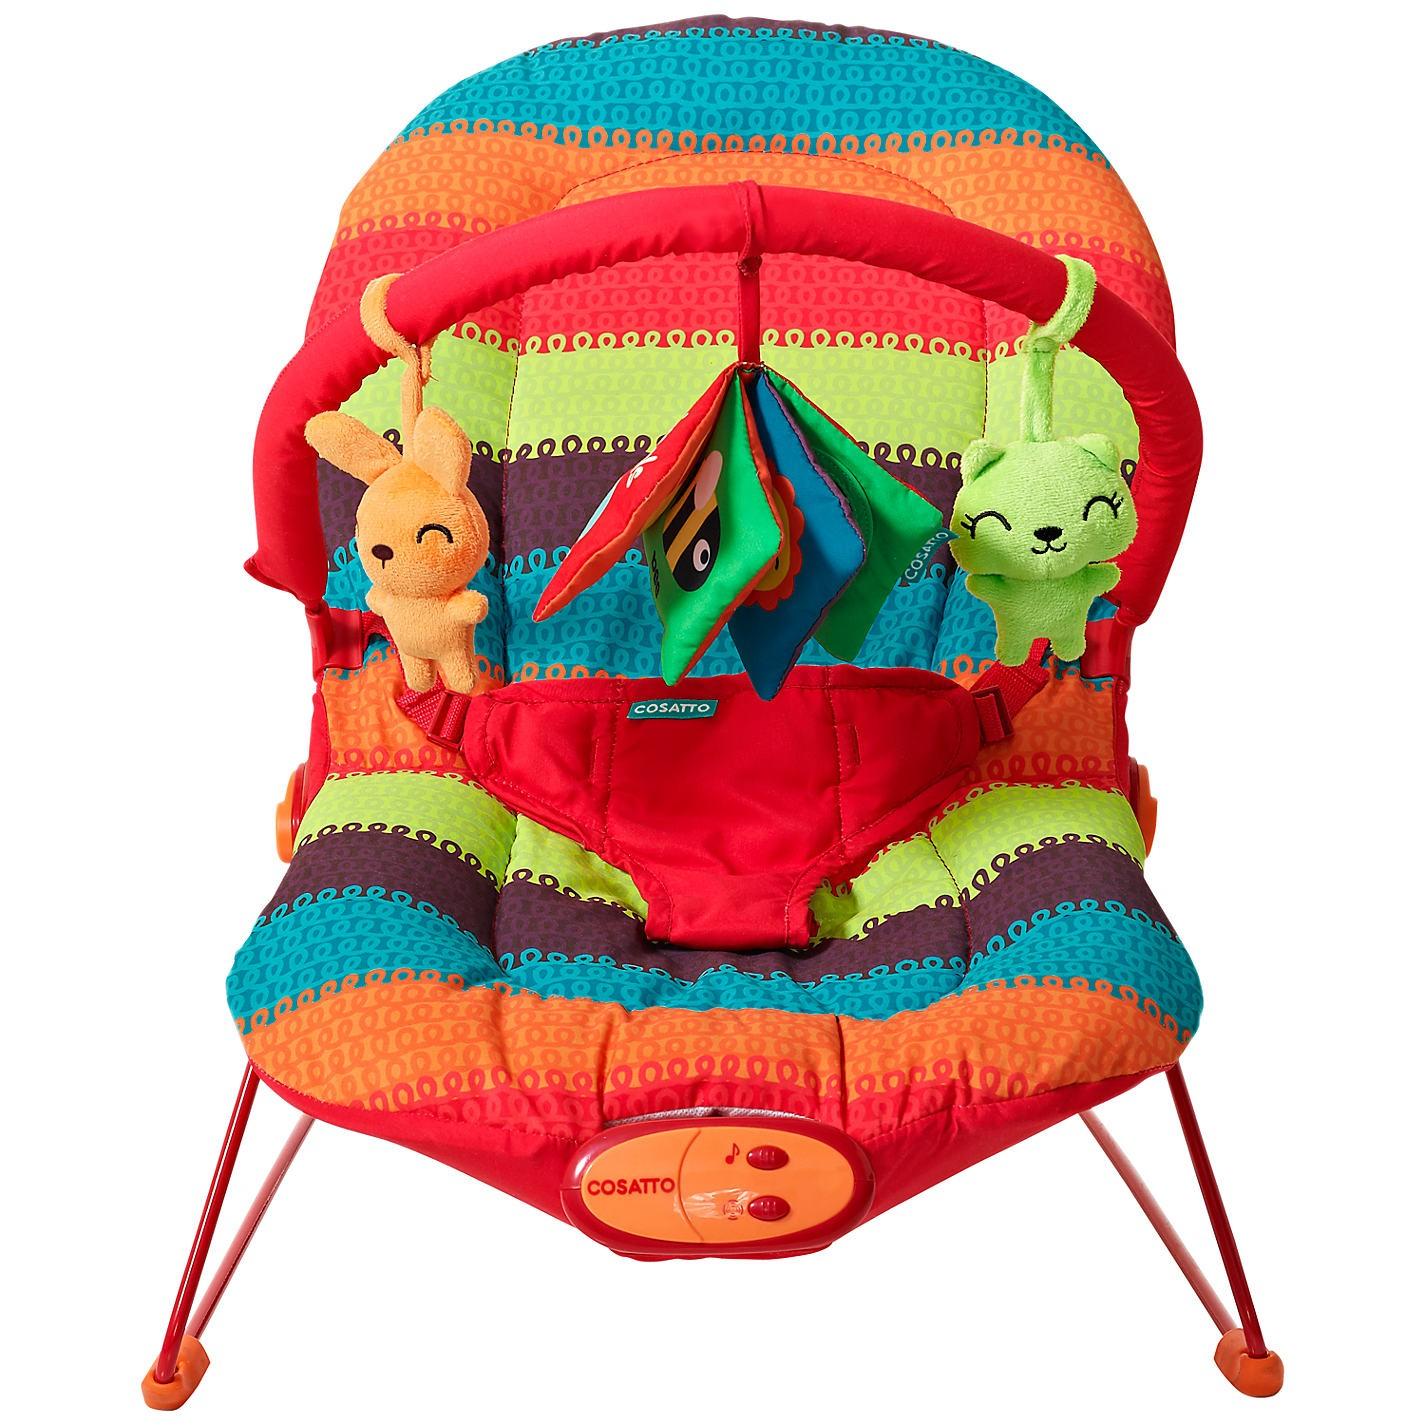 Sdraietta Cosatto Bobbin Knit